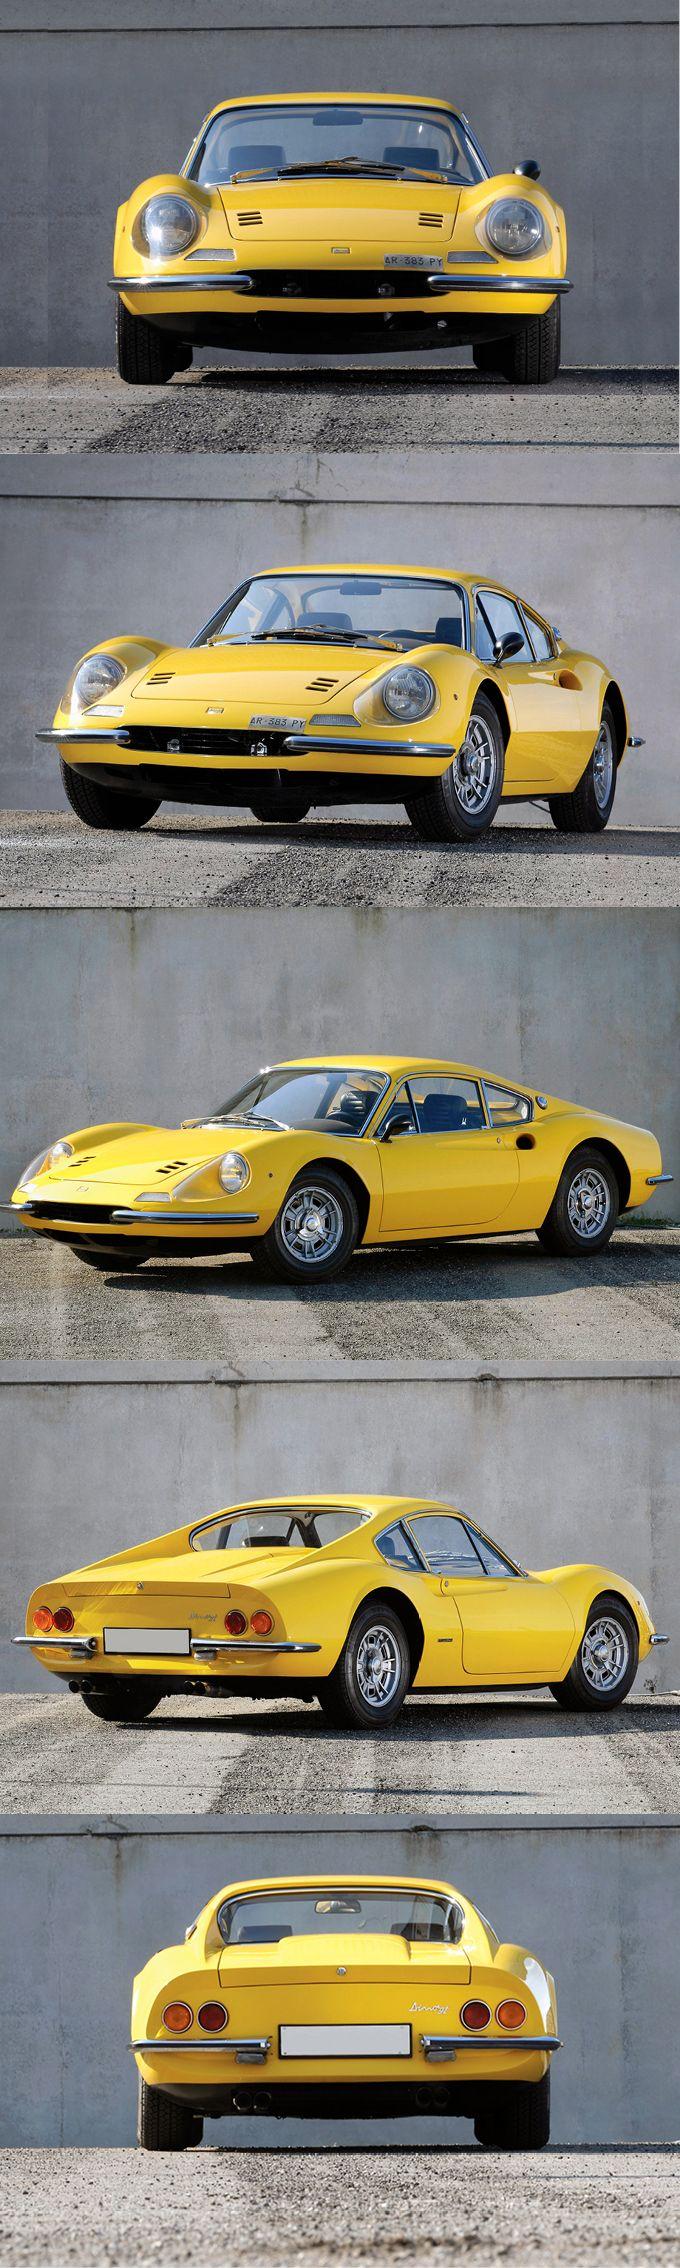 1966 Dino 206 GT / 180hp 2.0l V6 / Ferrari / yellow / Italy